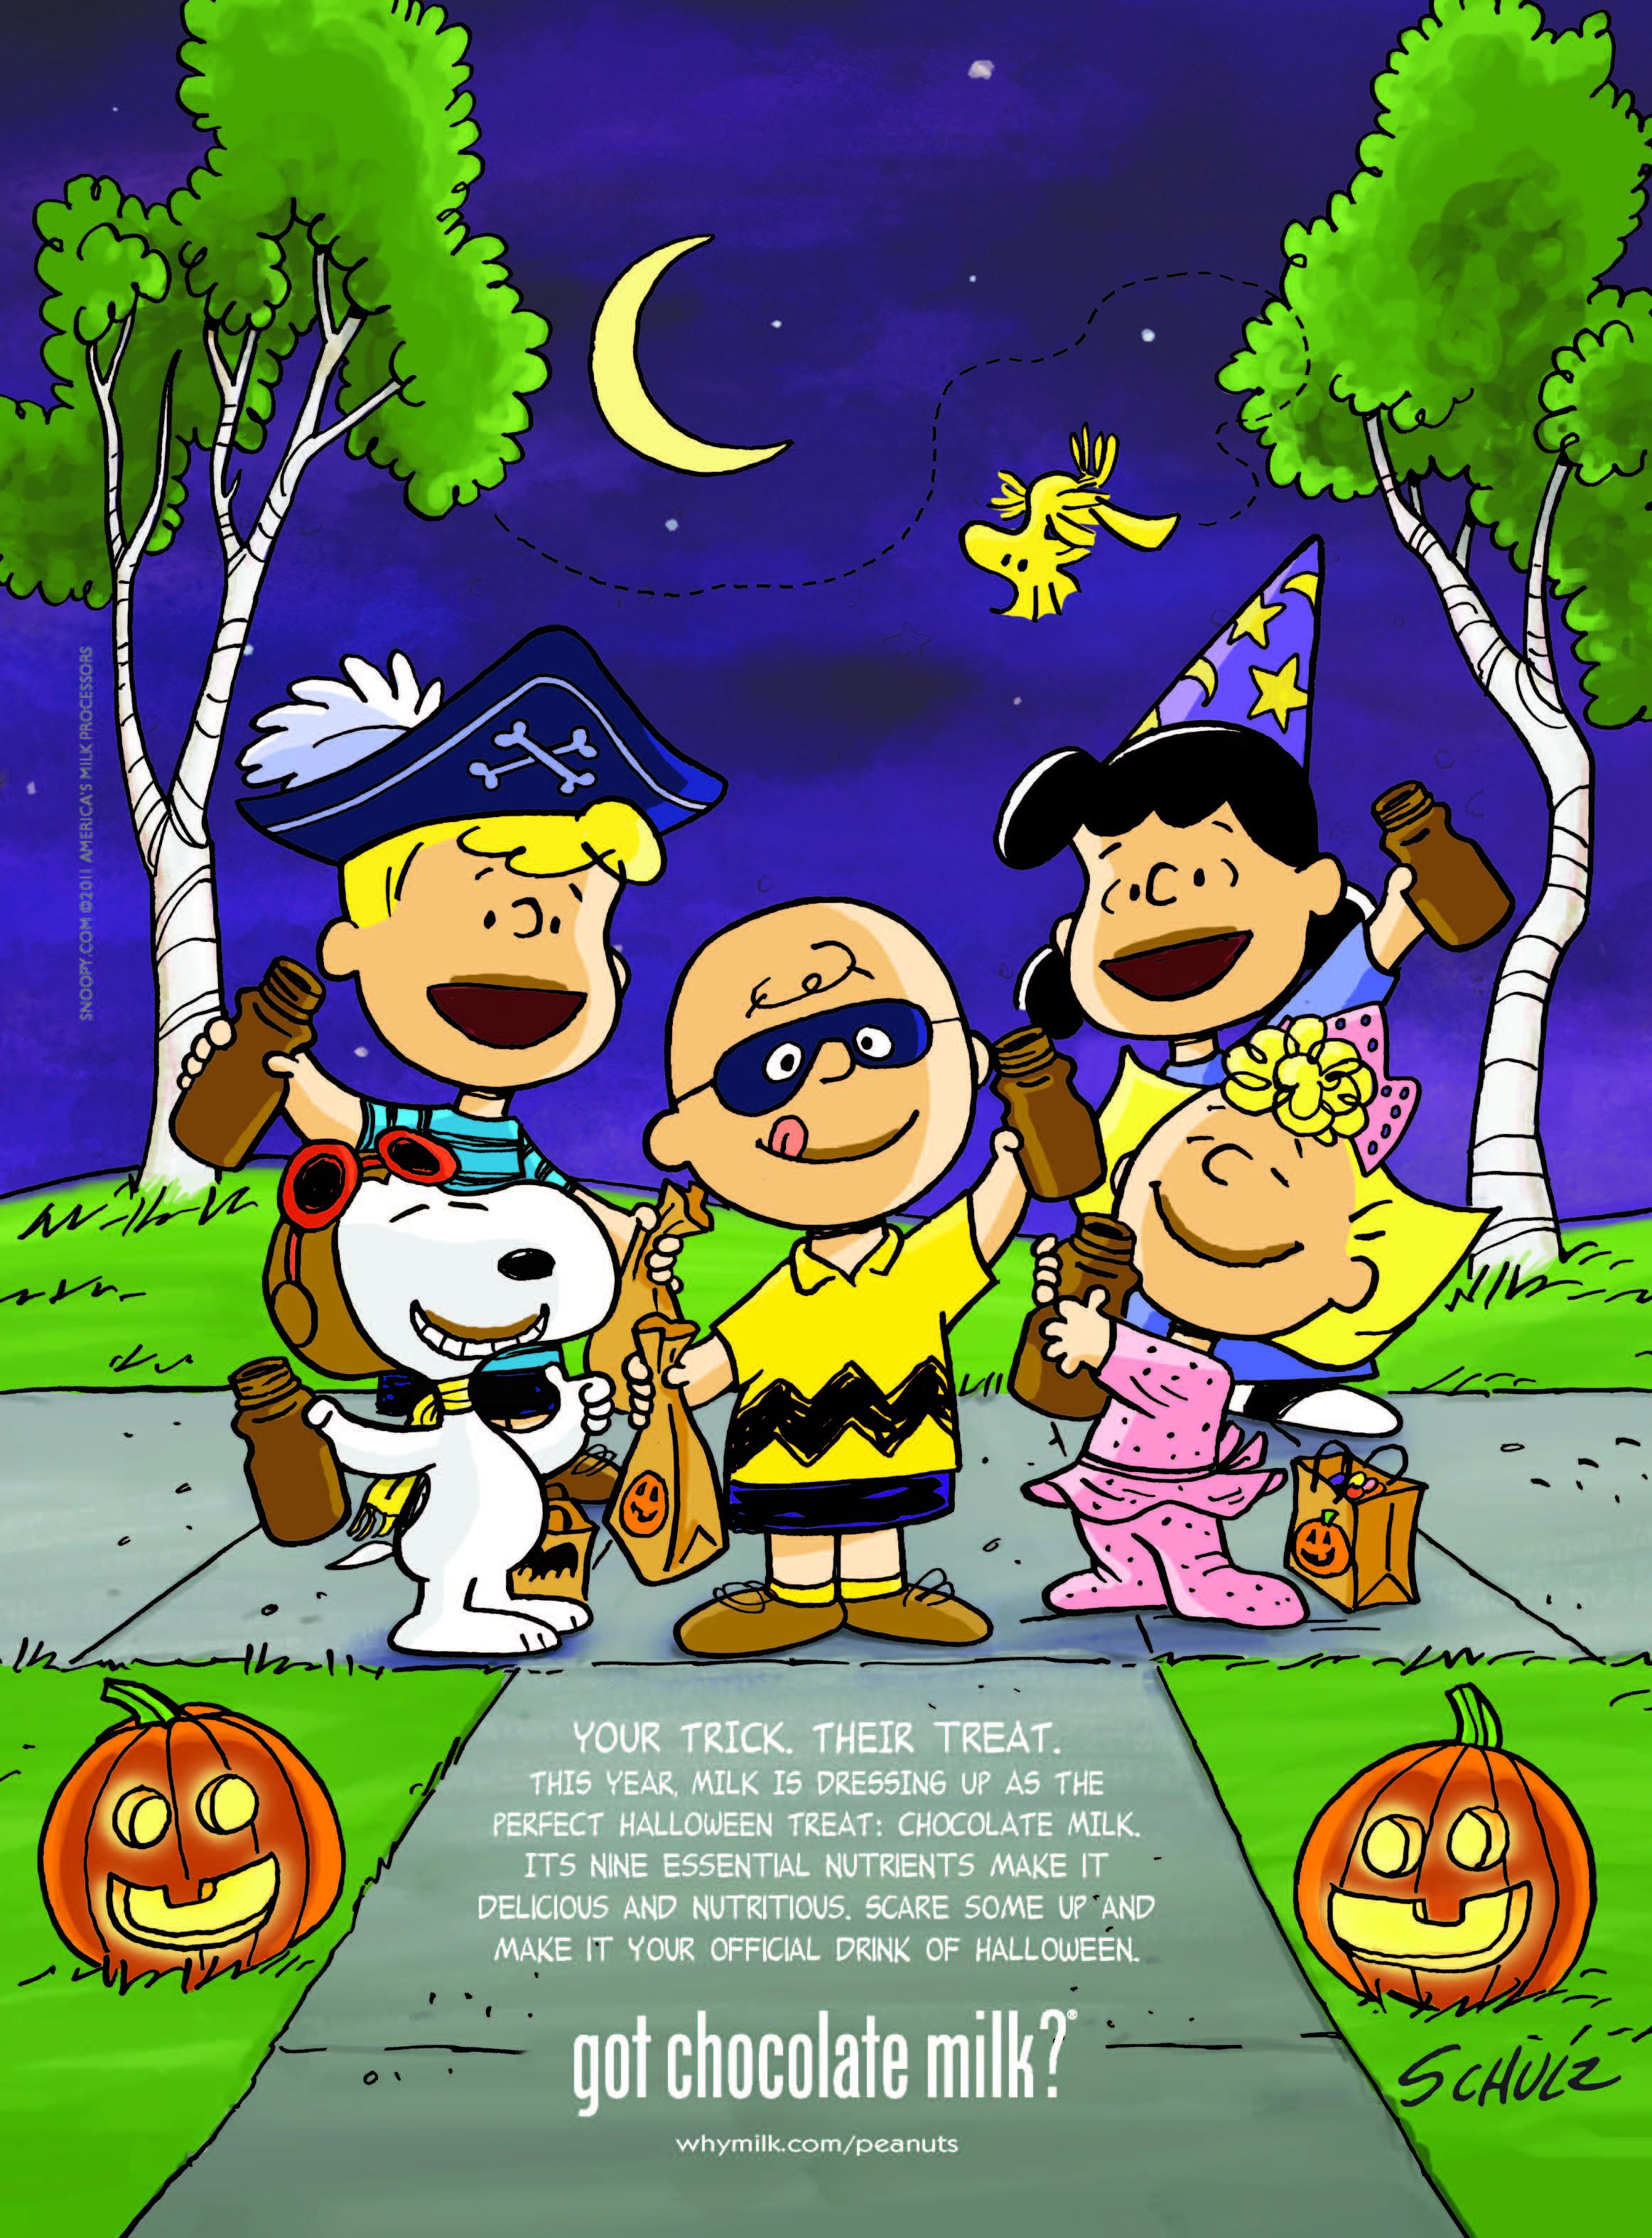 sc 1 st  Koupon Karen & Snoopy Great Pumpkin Prize Pack Giveaway (ends 10/23)